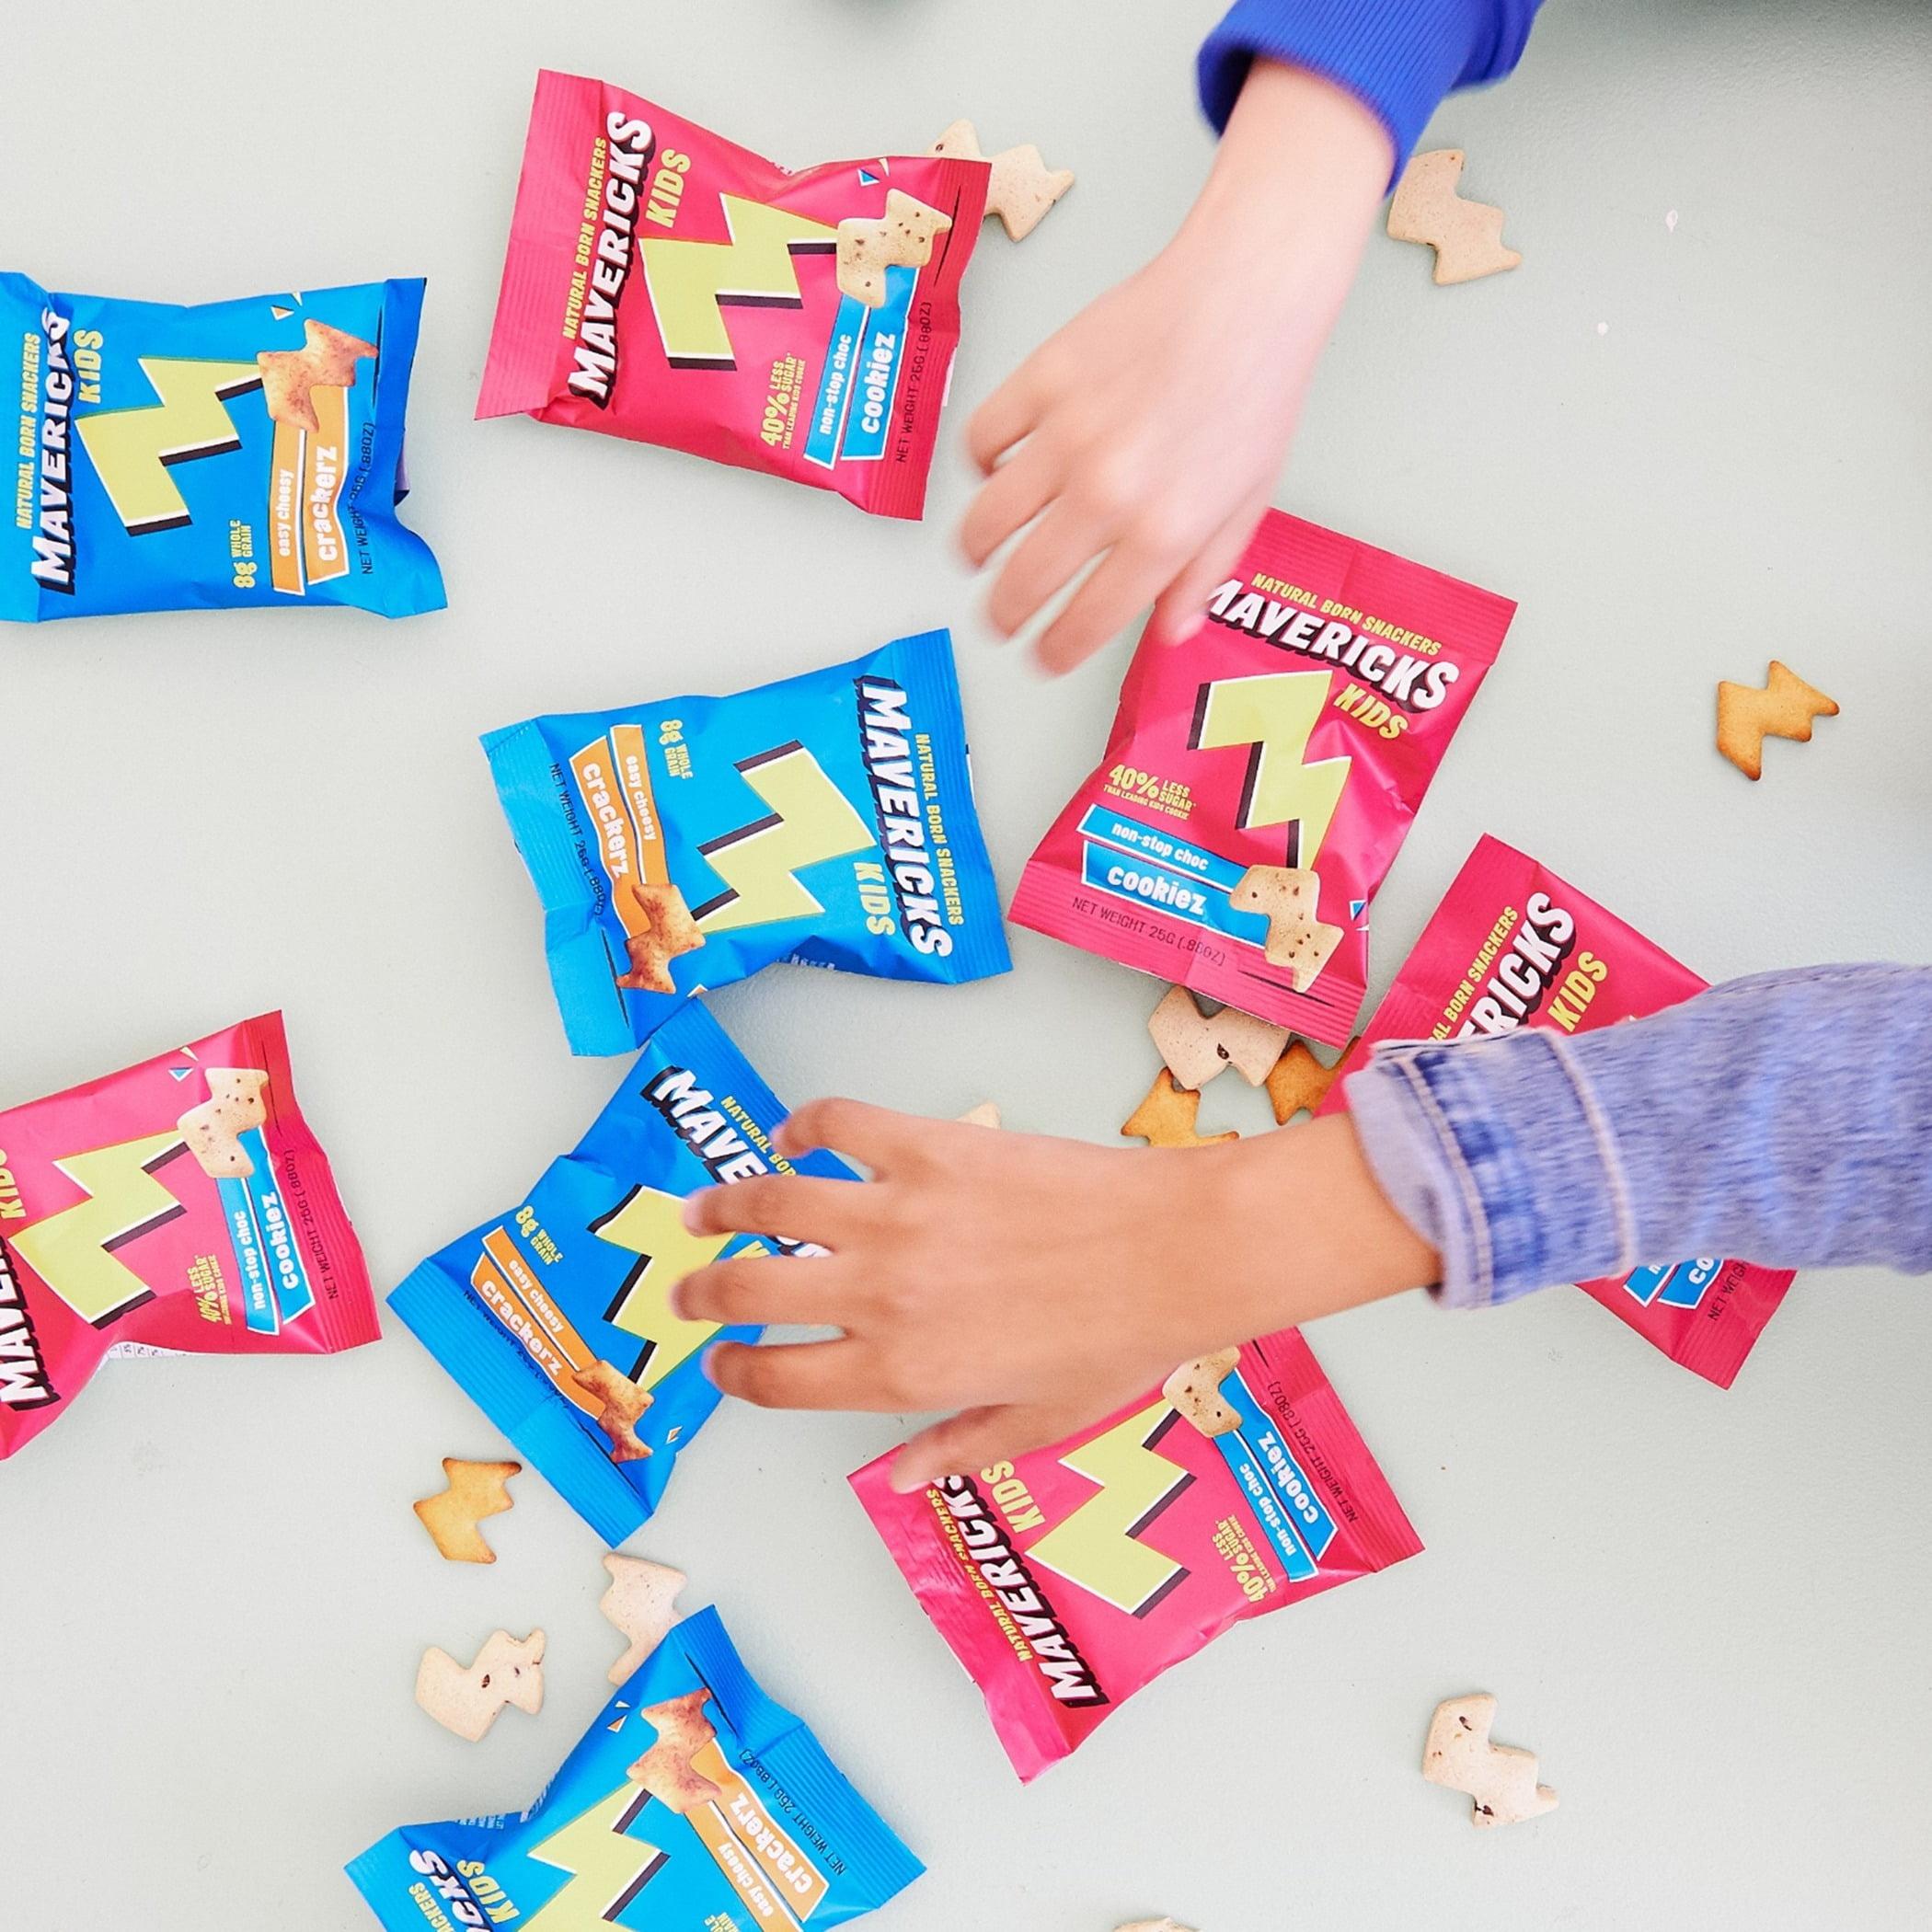 Snack bags, Puffed Snacks, Crunchy Snacks, Kids, Hand, Wrist, Finger